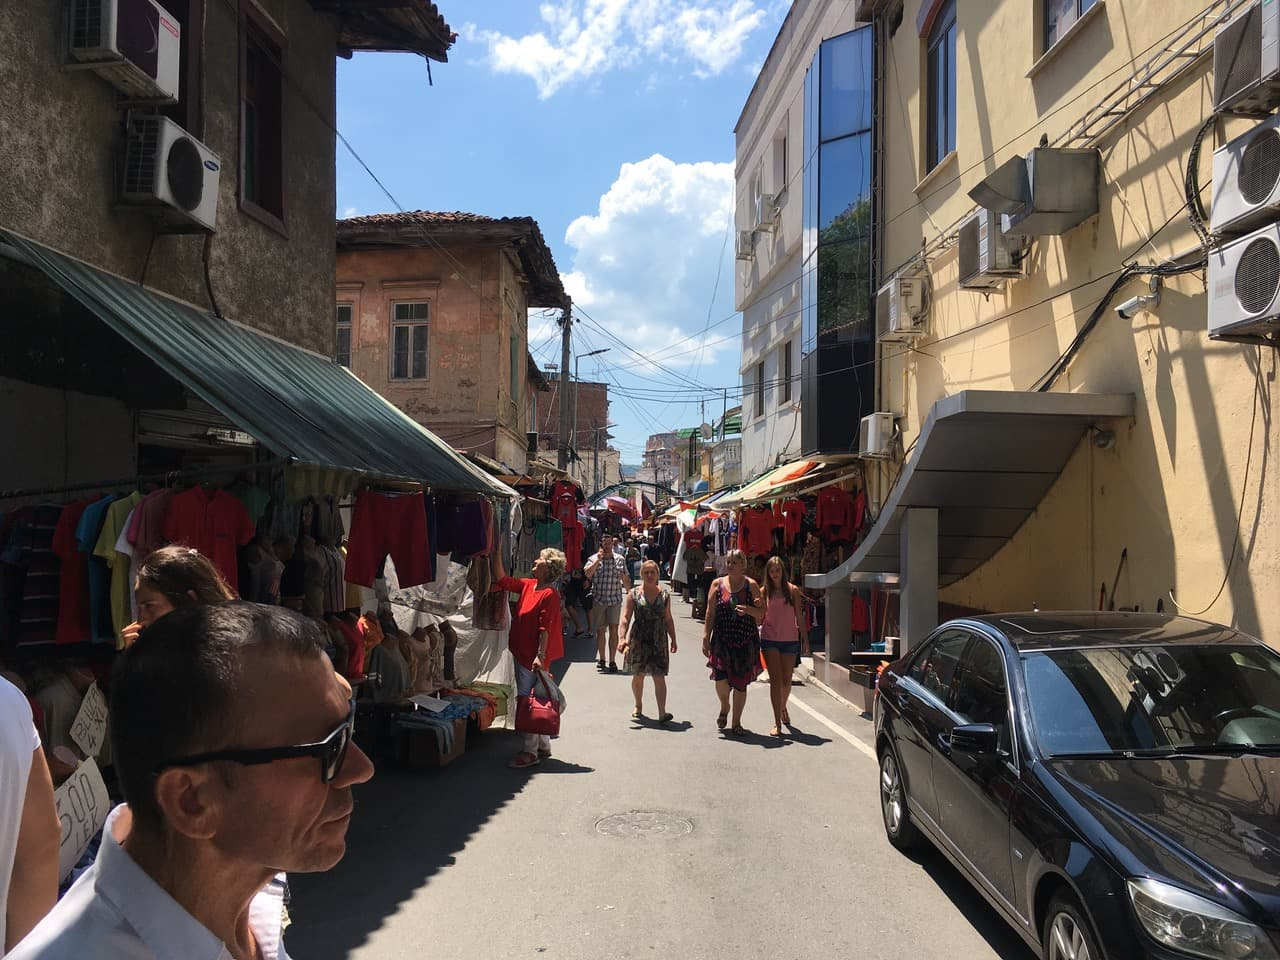 Tirana Tightness of small-scale historic streets